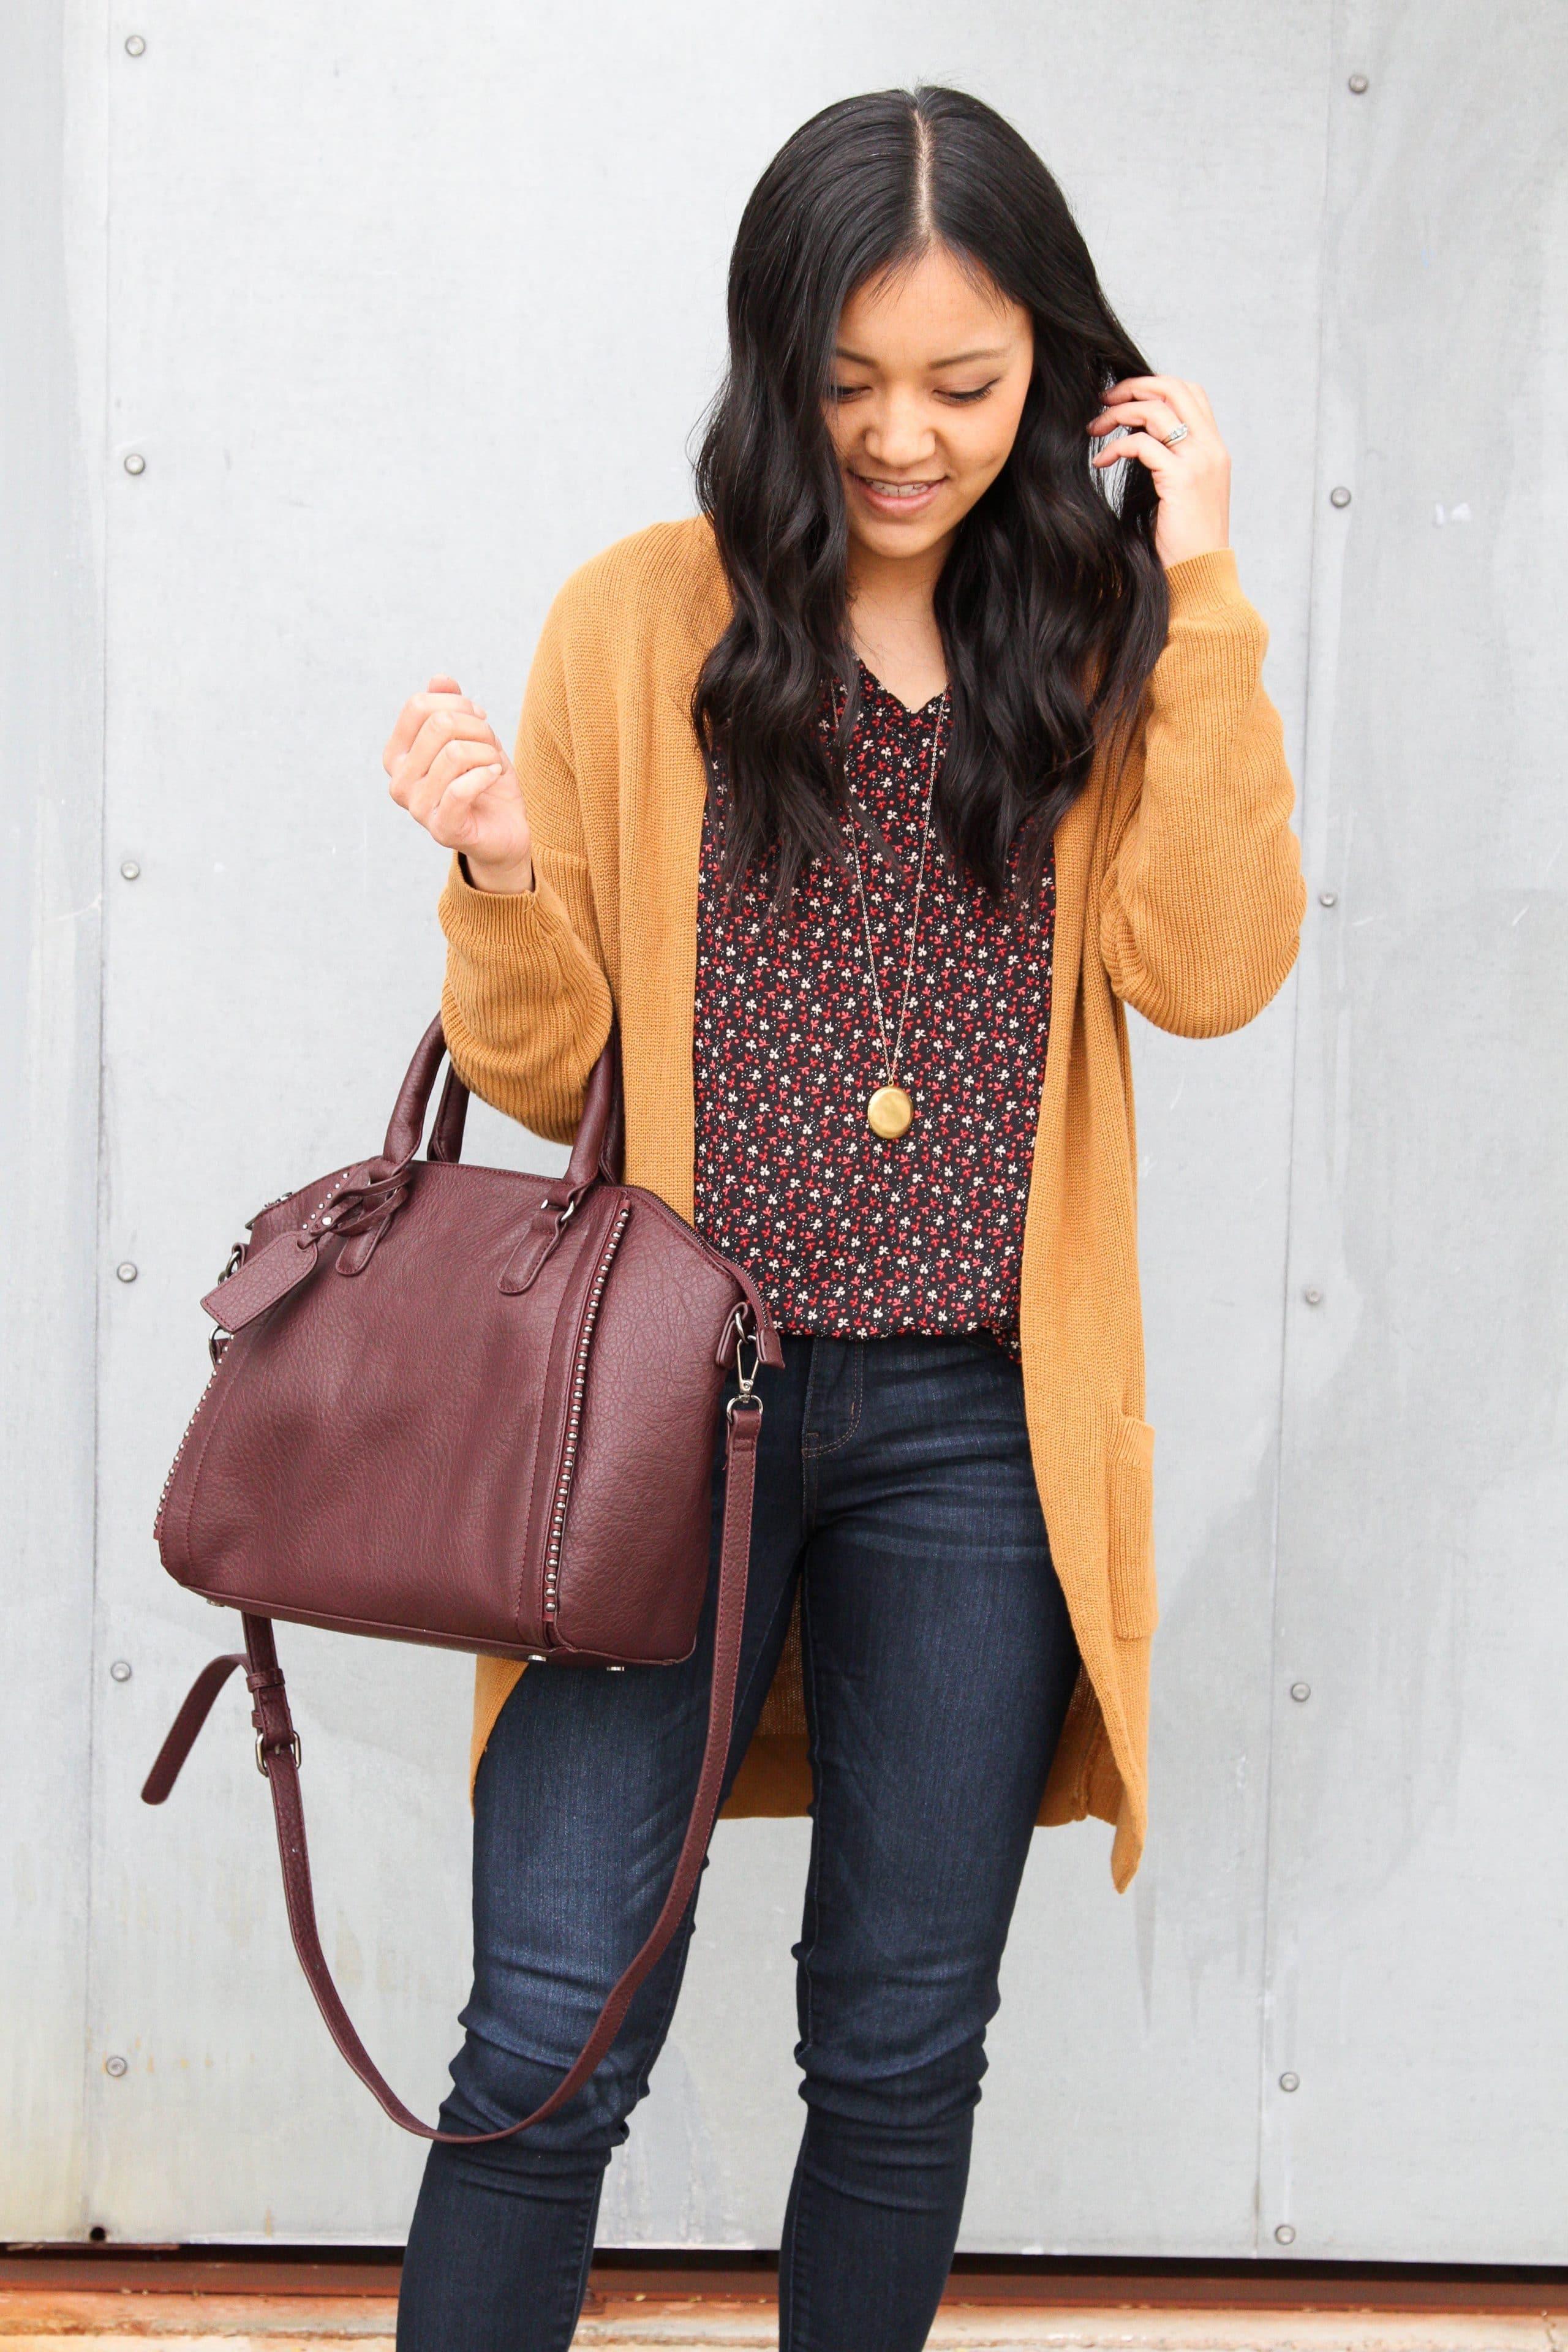 Floral blouse + Tan Cardigan + Maroon Bag + Gold Pendant